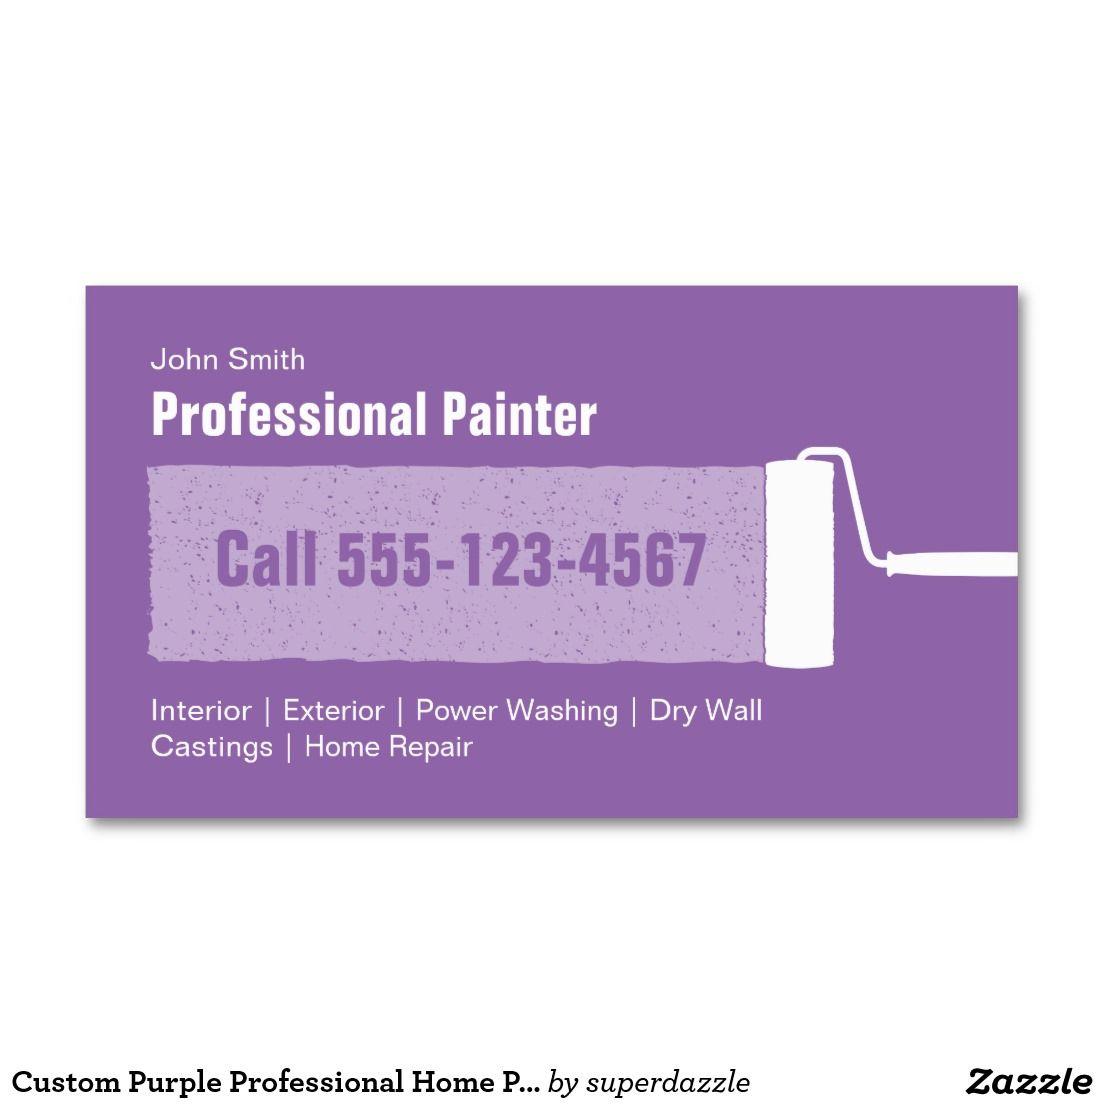 Custom Purple Professional Home Painting Business Card   Elegant ...